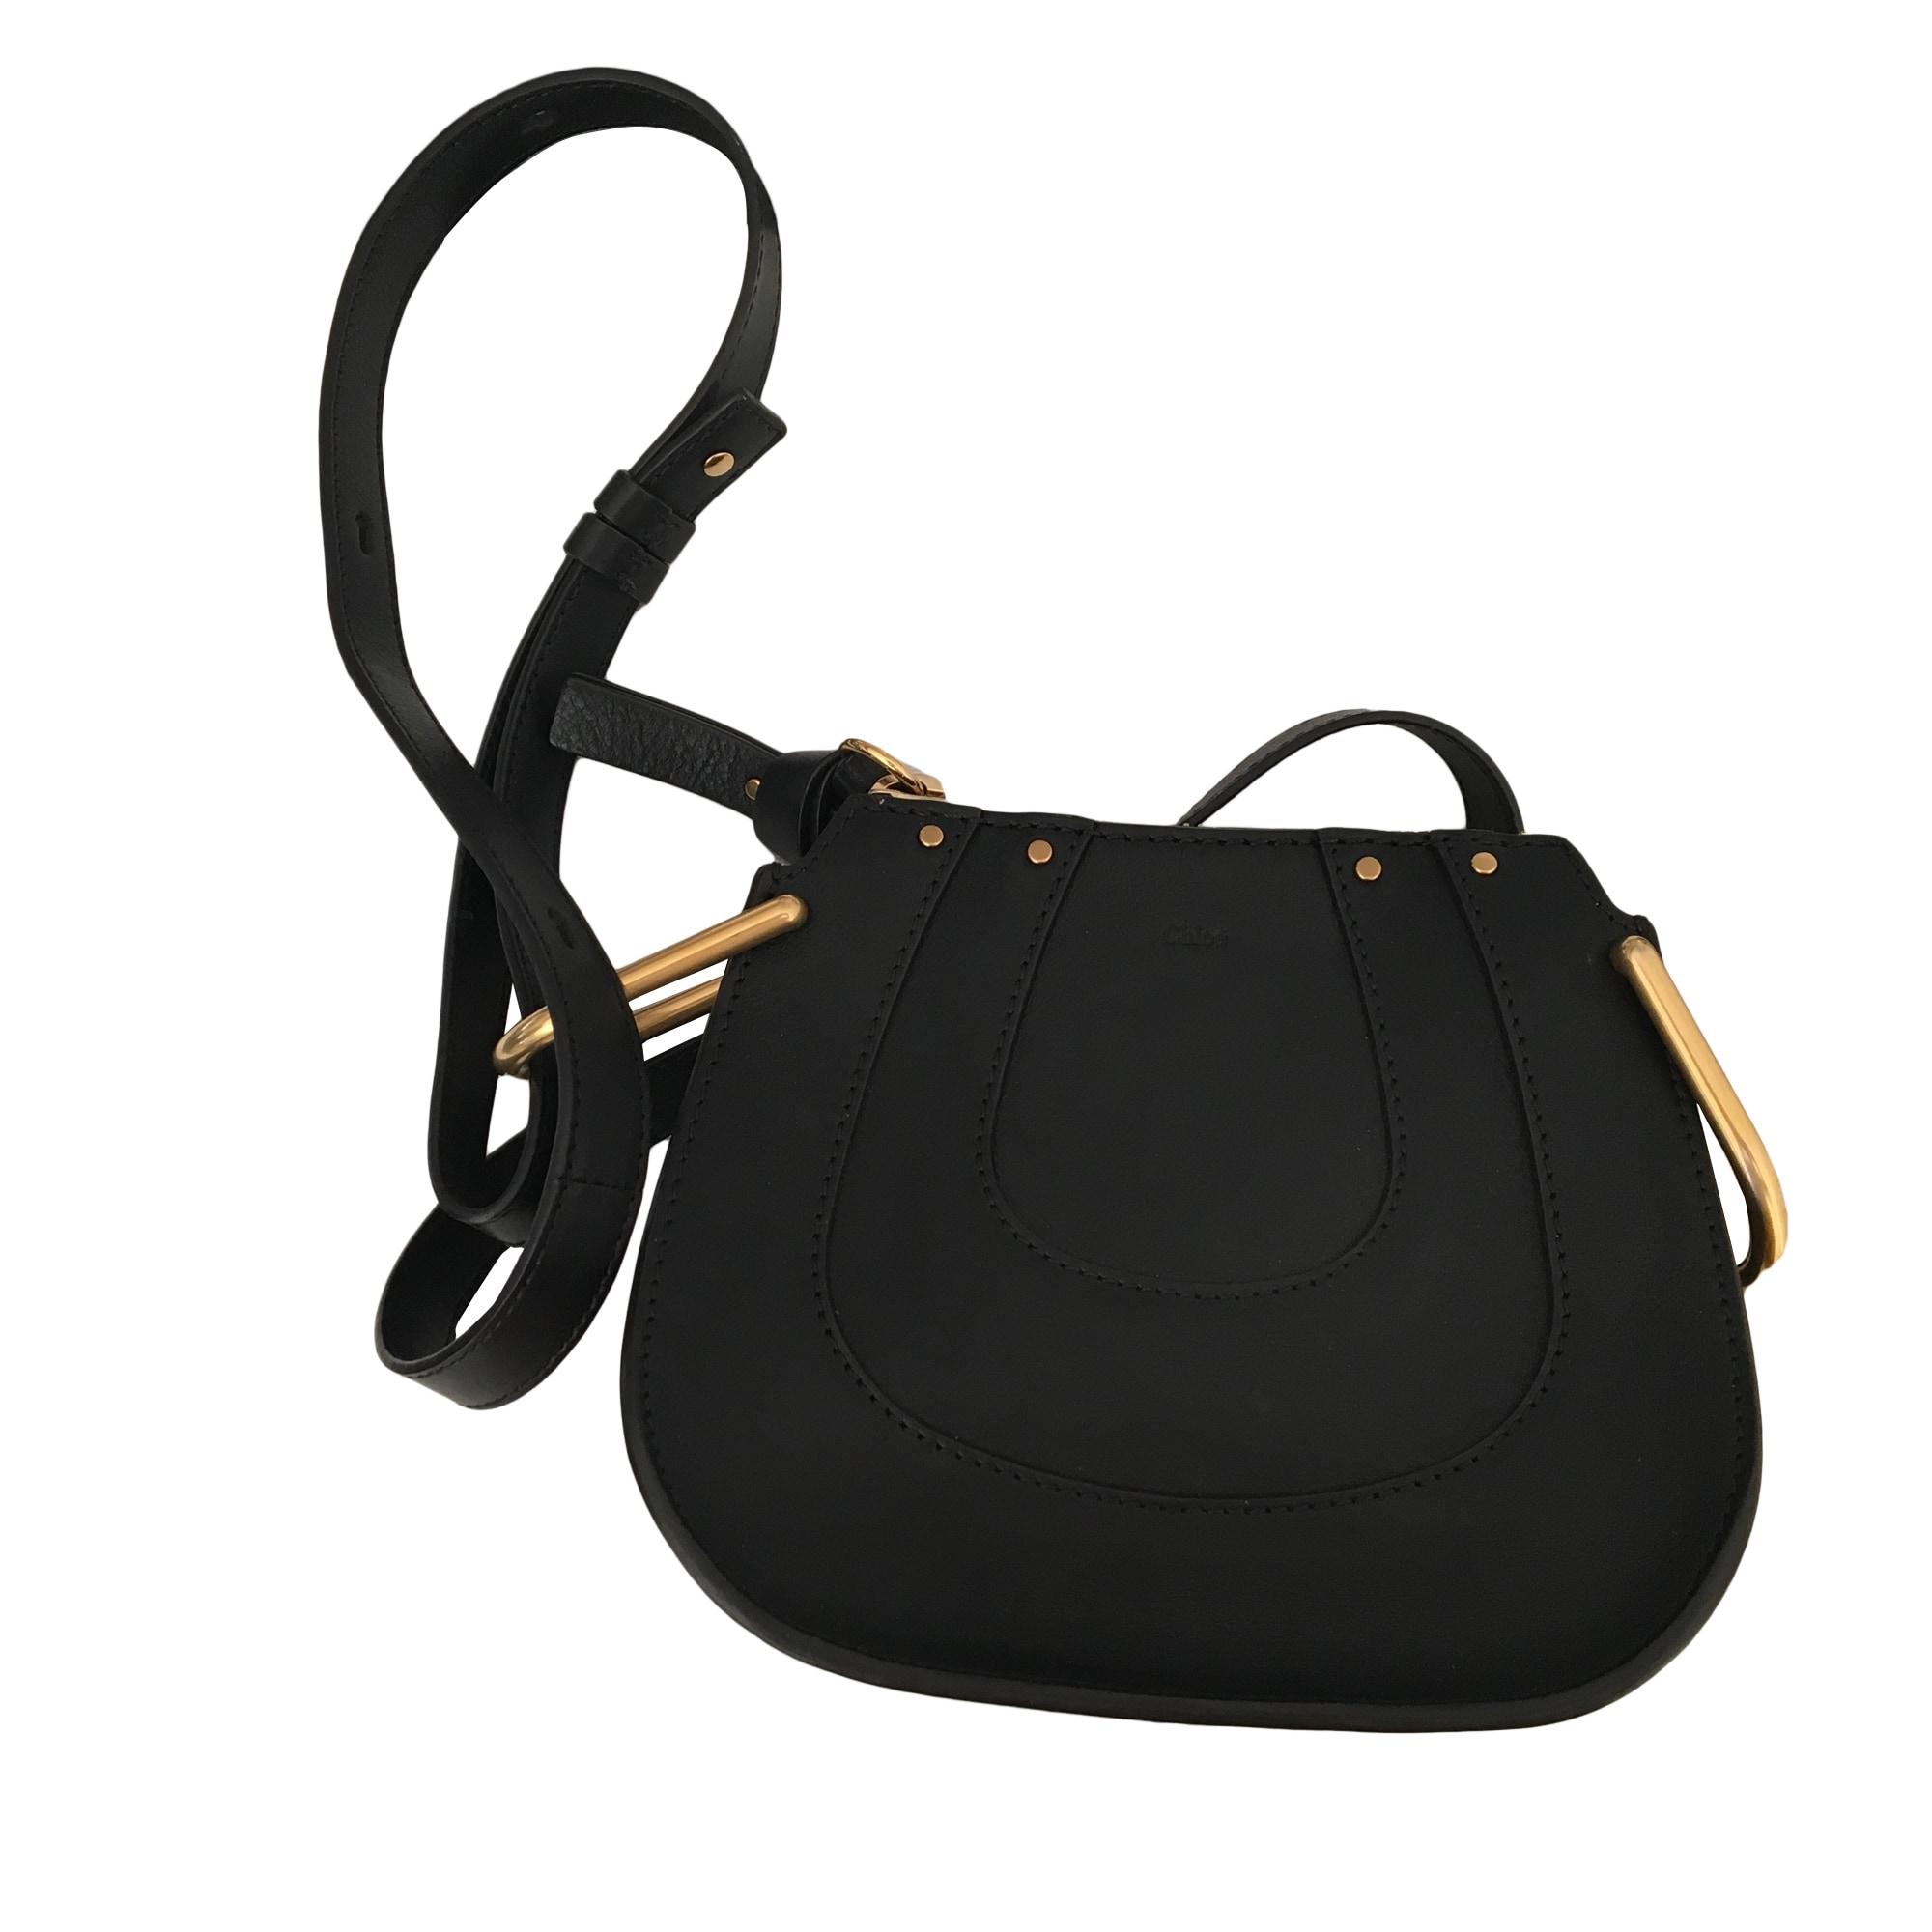 sac en bandouli re en cuir chlo noir vendu par stella fox 6515702. Black Bedroom Furniture Sets. Home Design Ideas